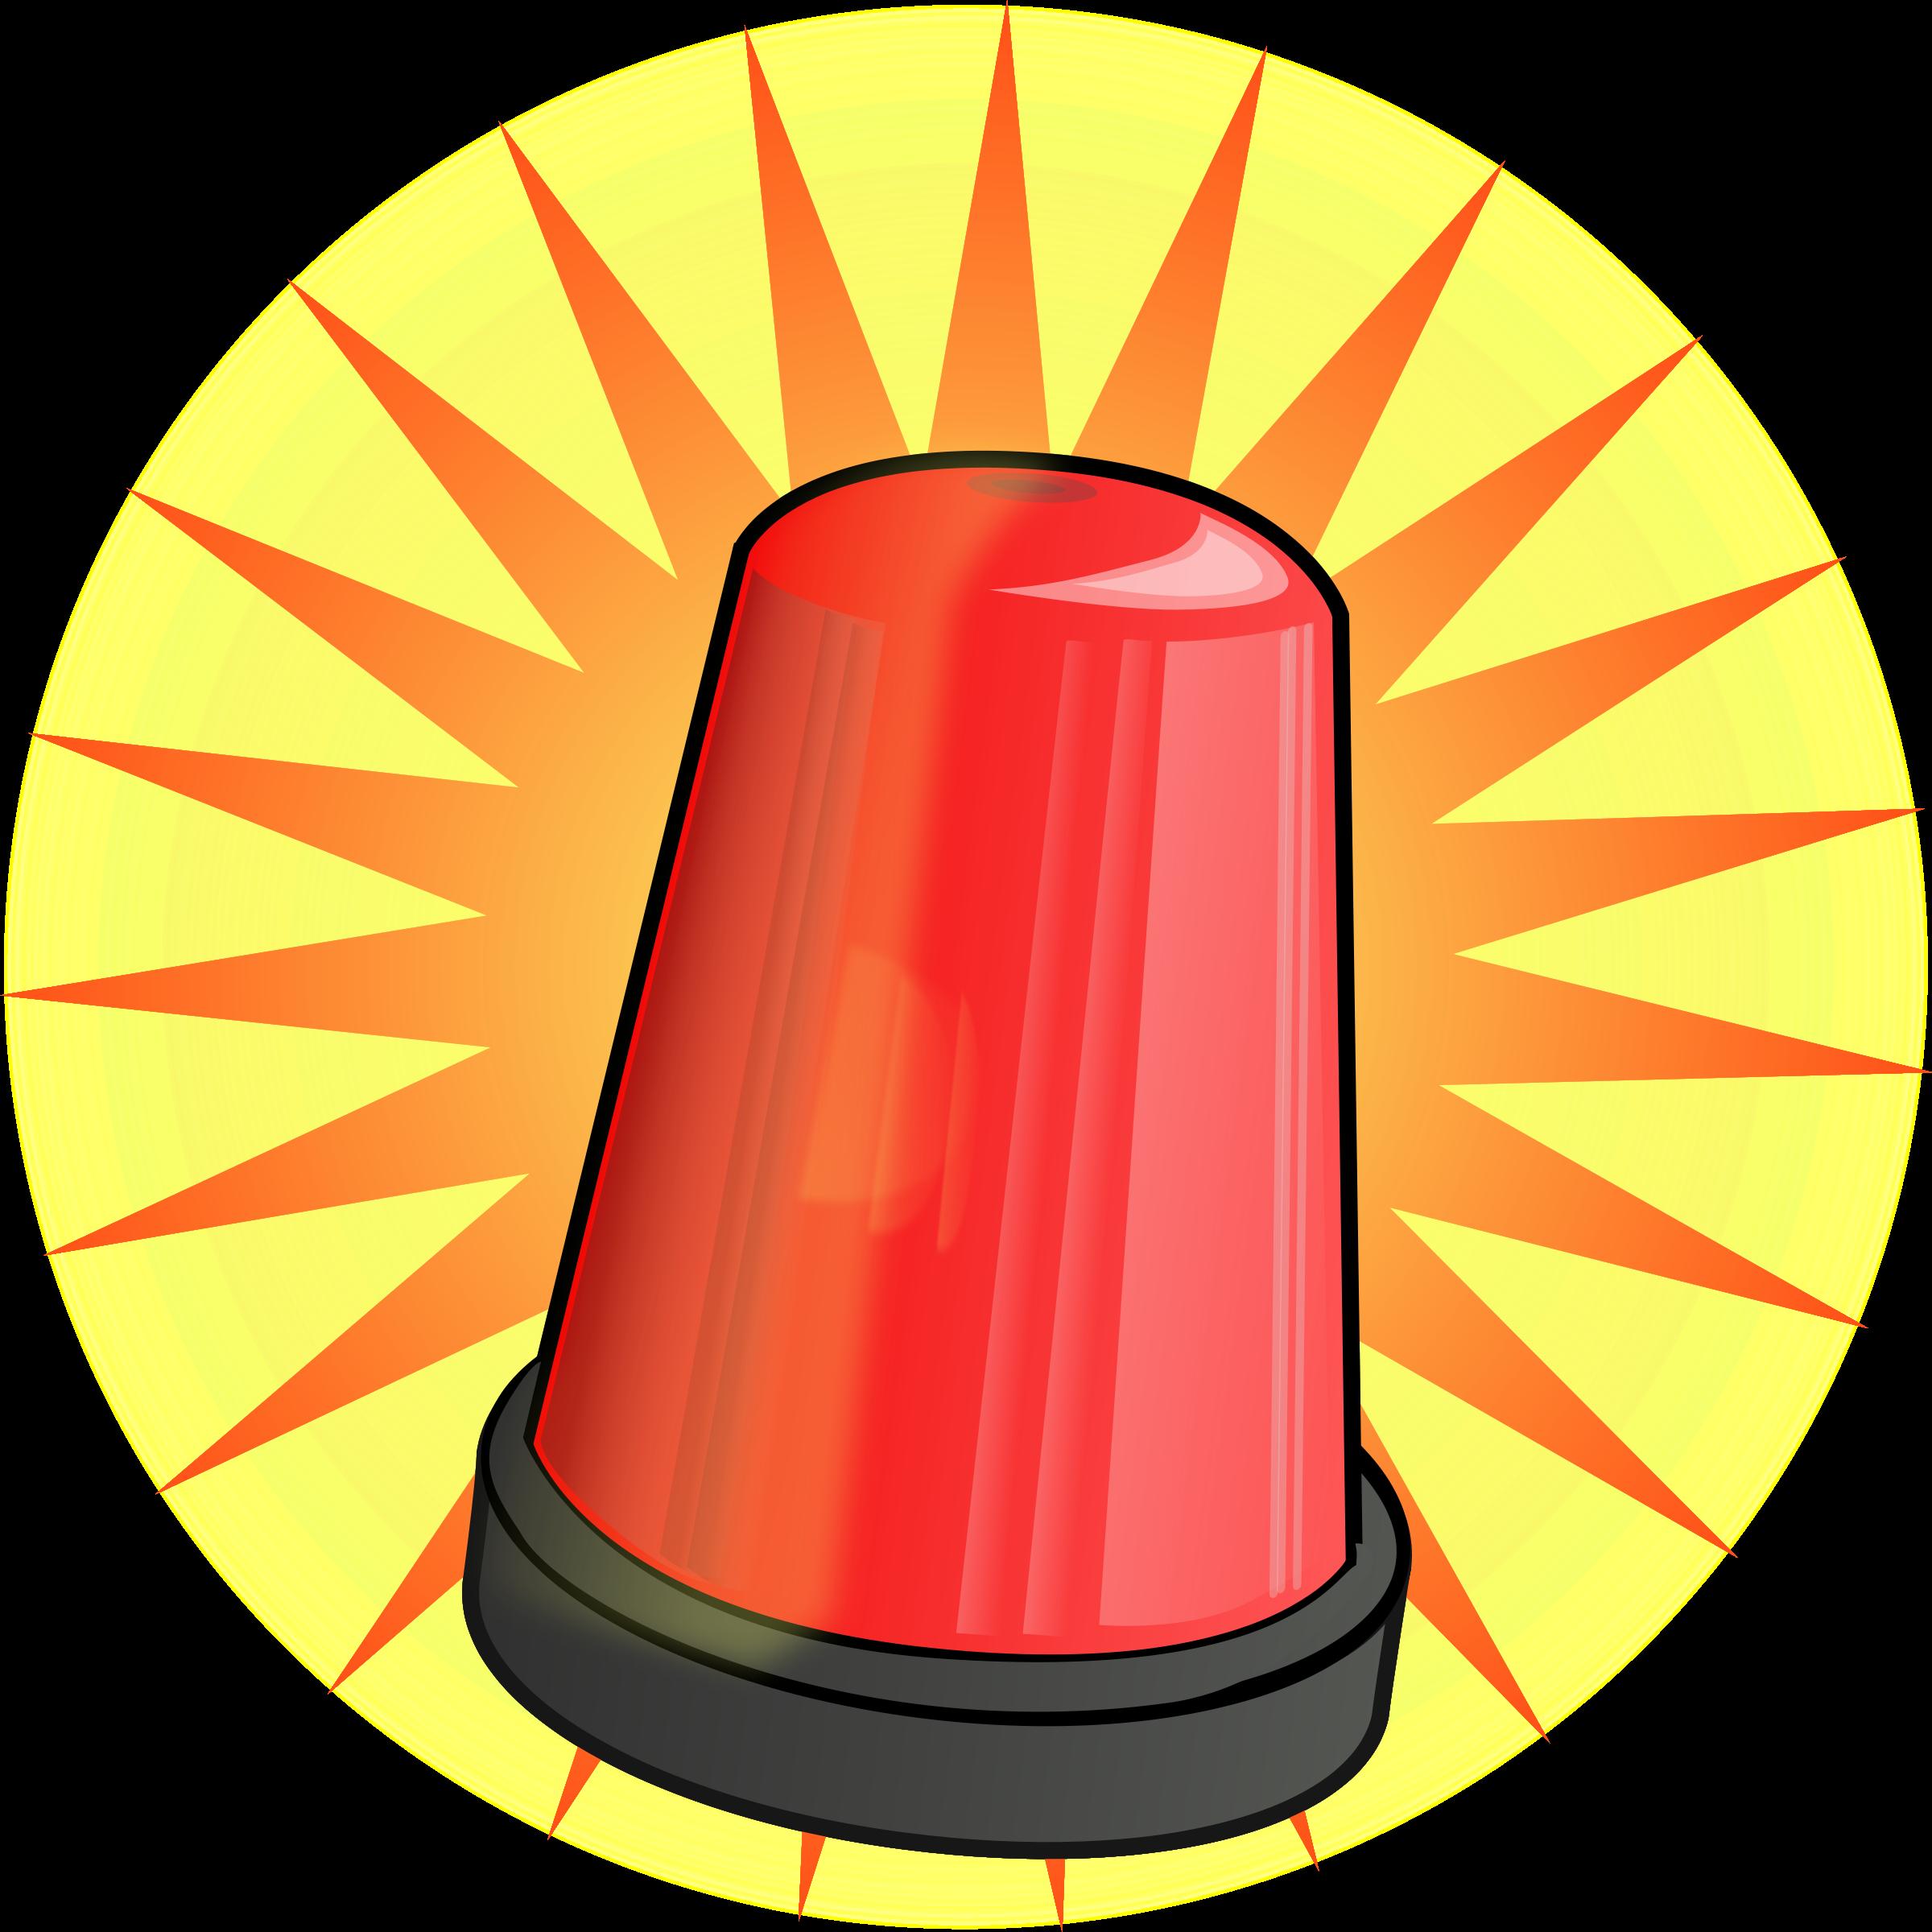 clip art download alarm clipart siren #75982432